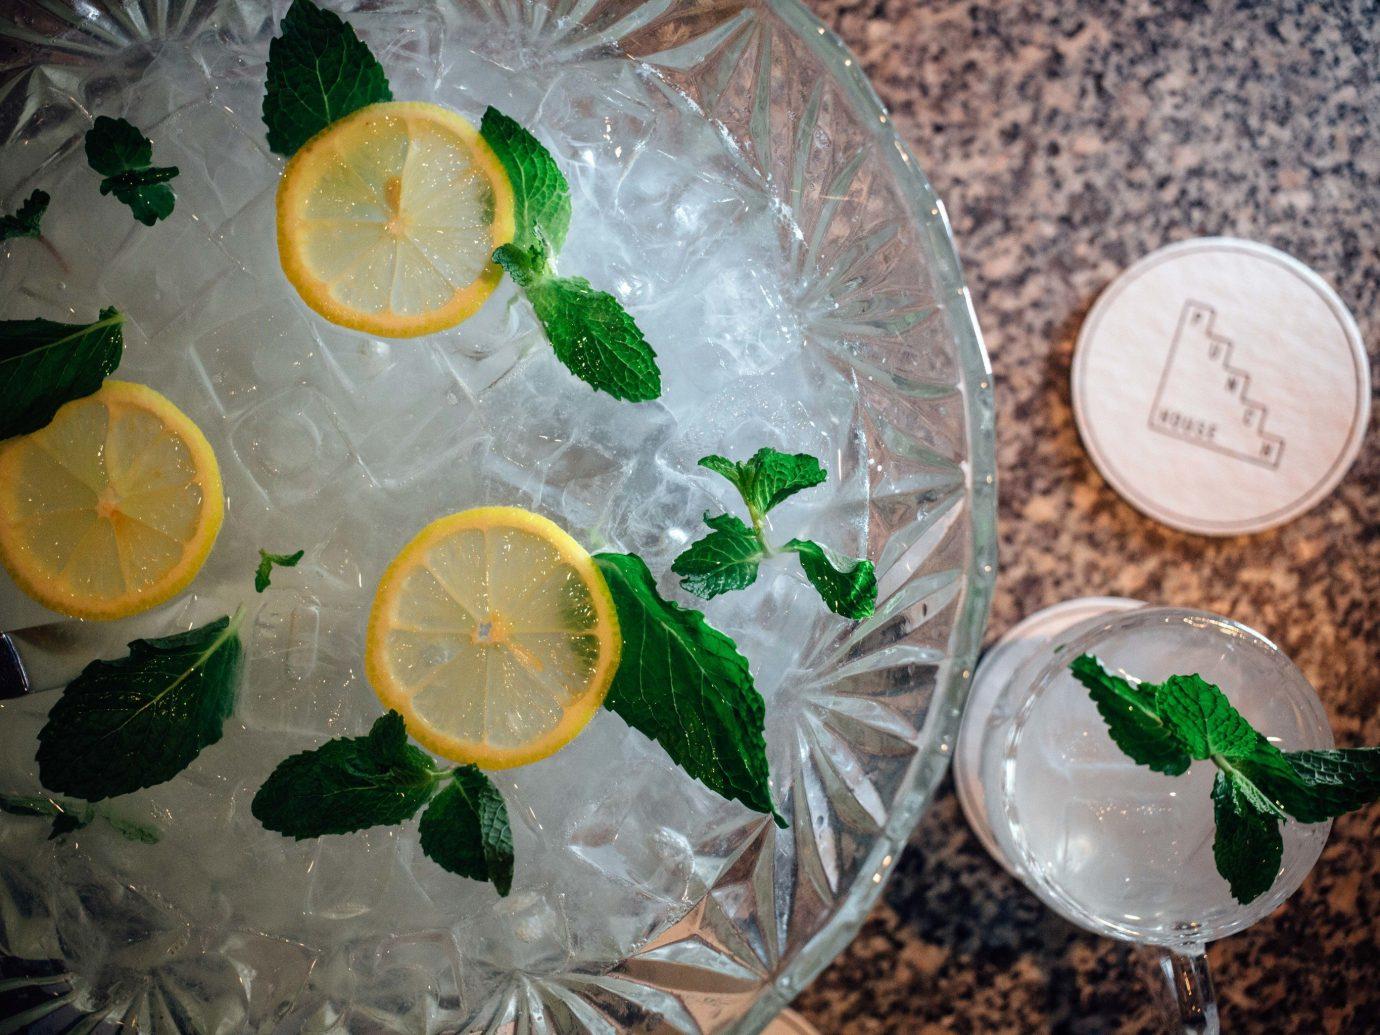 Trip Ideas green yellow food Drink mojito lemonade gin and tonic glass lime lemon lime cocktail mint julep vodka and tonic lemon plastic several